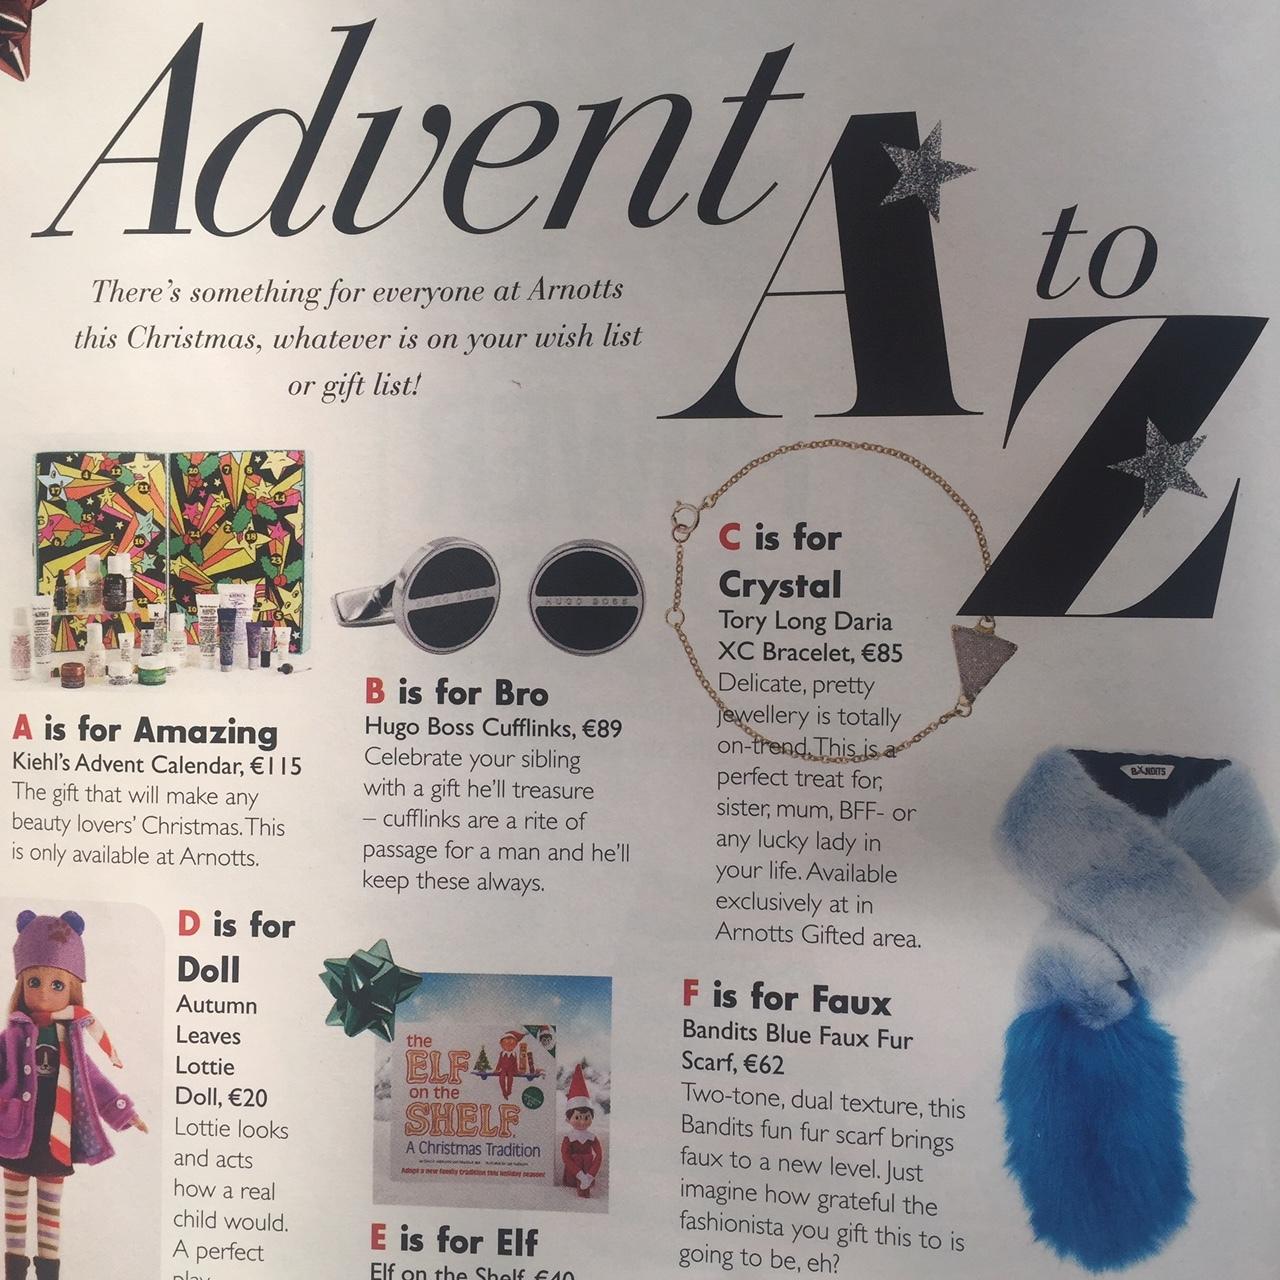 Stellar Magazine December 2016 - Daria T bracelet included in the Advent A-Z gift guide in Stellar Magazine December 2016